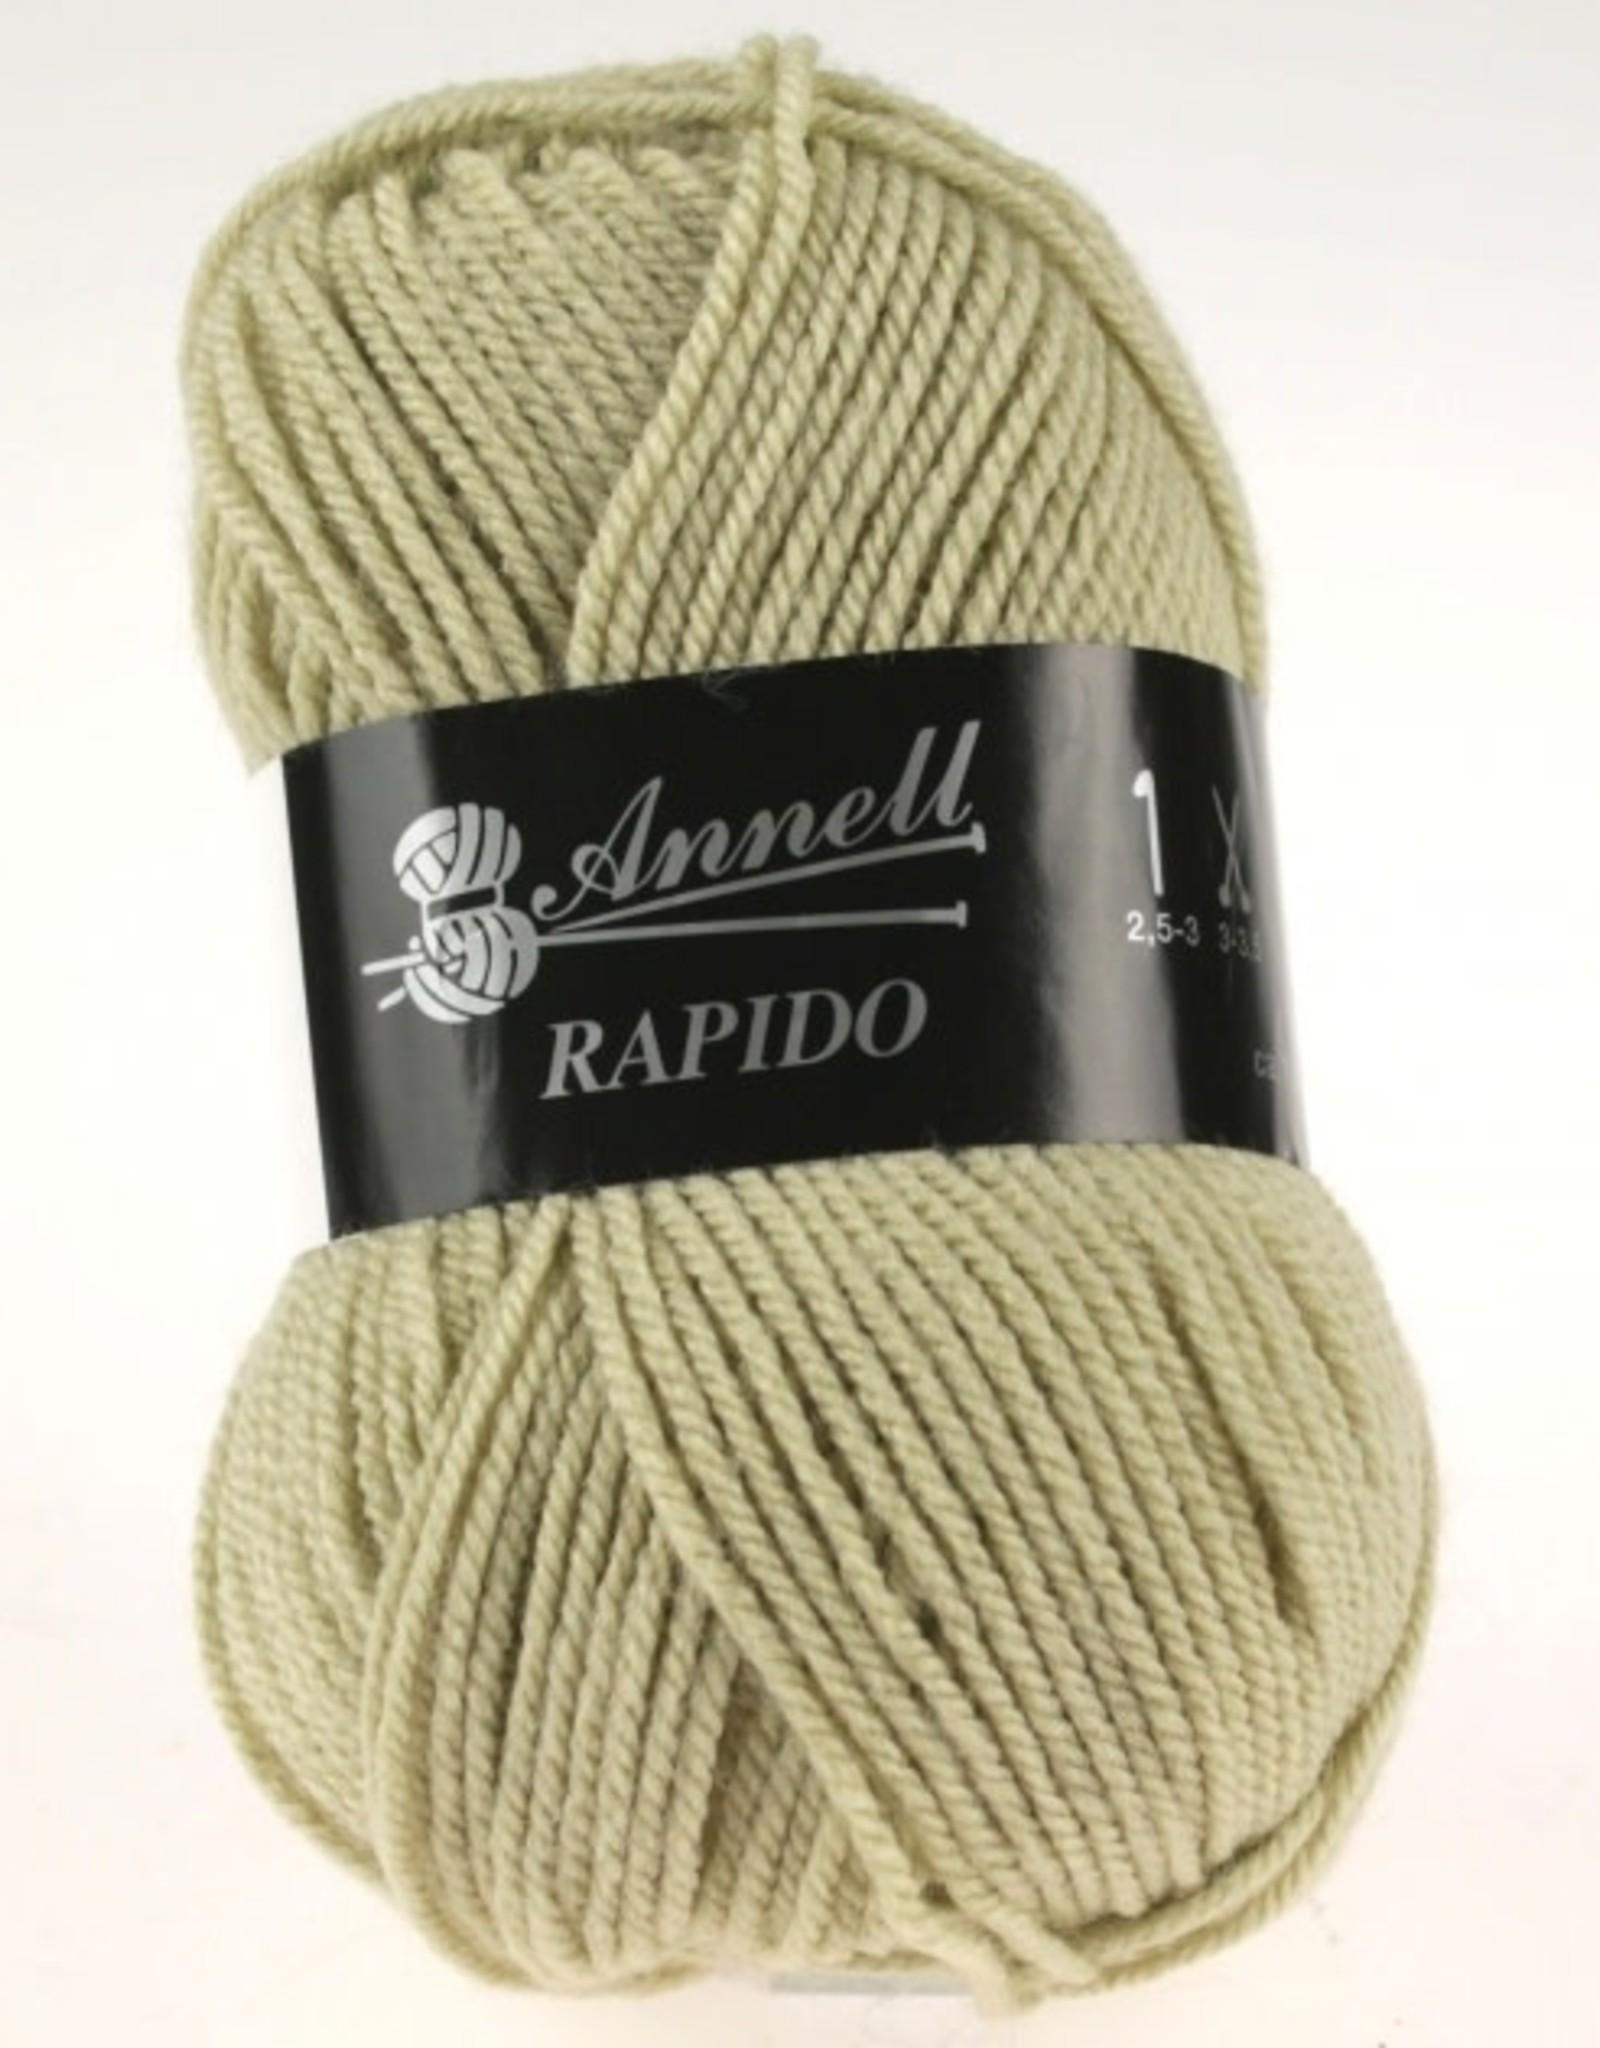 Annell Annell rapido 3244